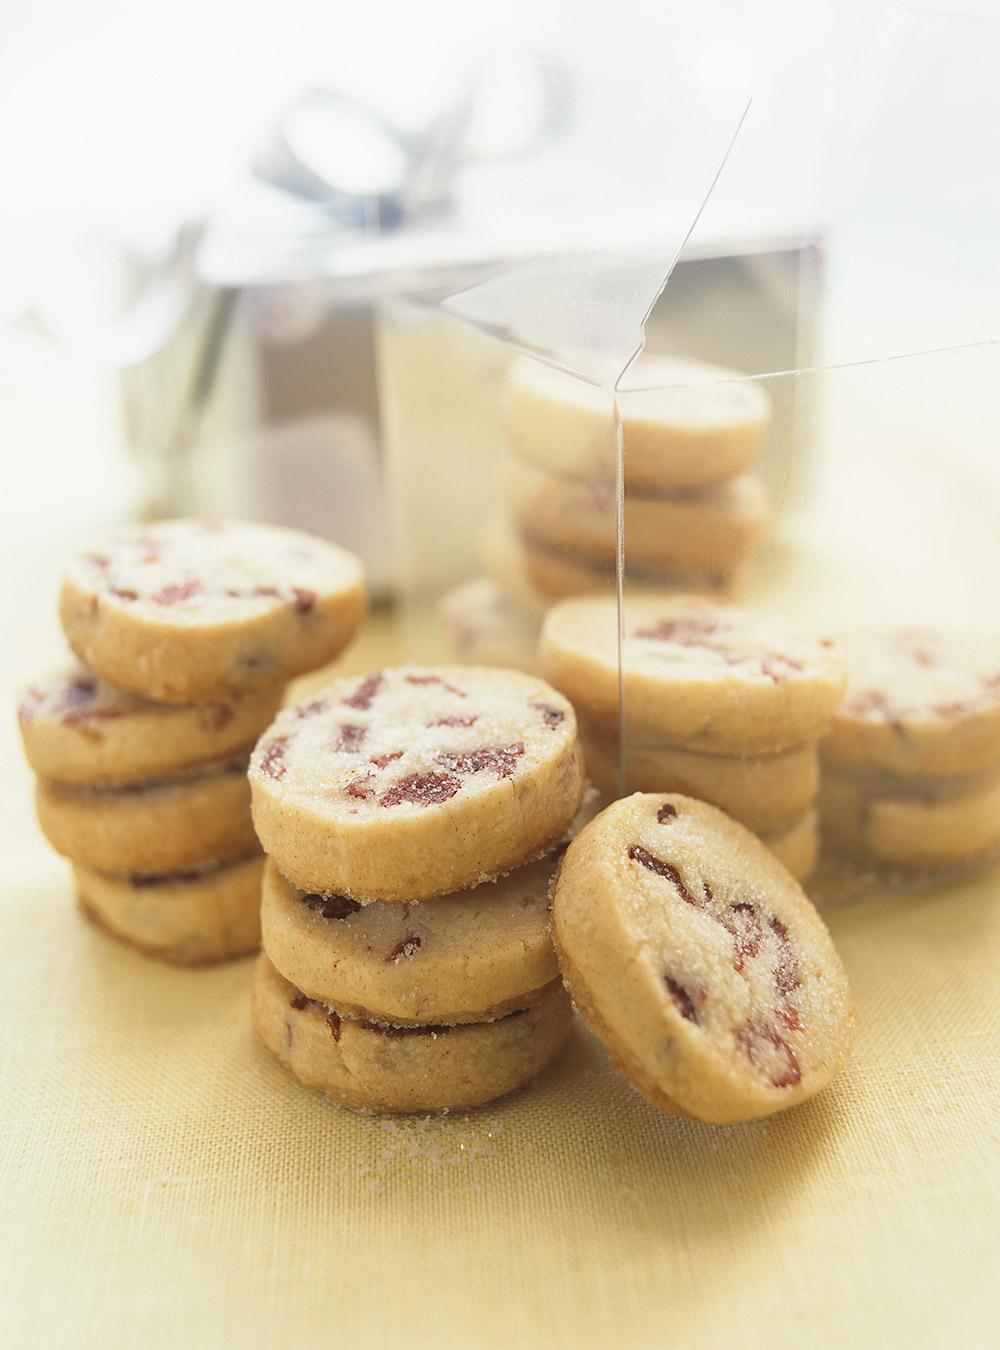 Ukusni keksi s brusnicama